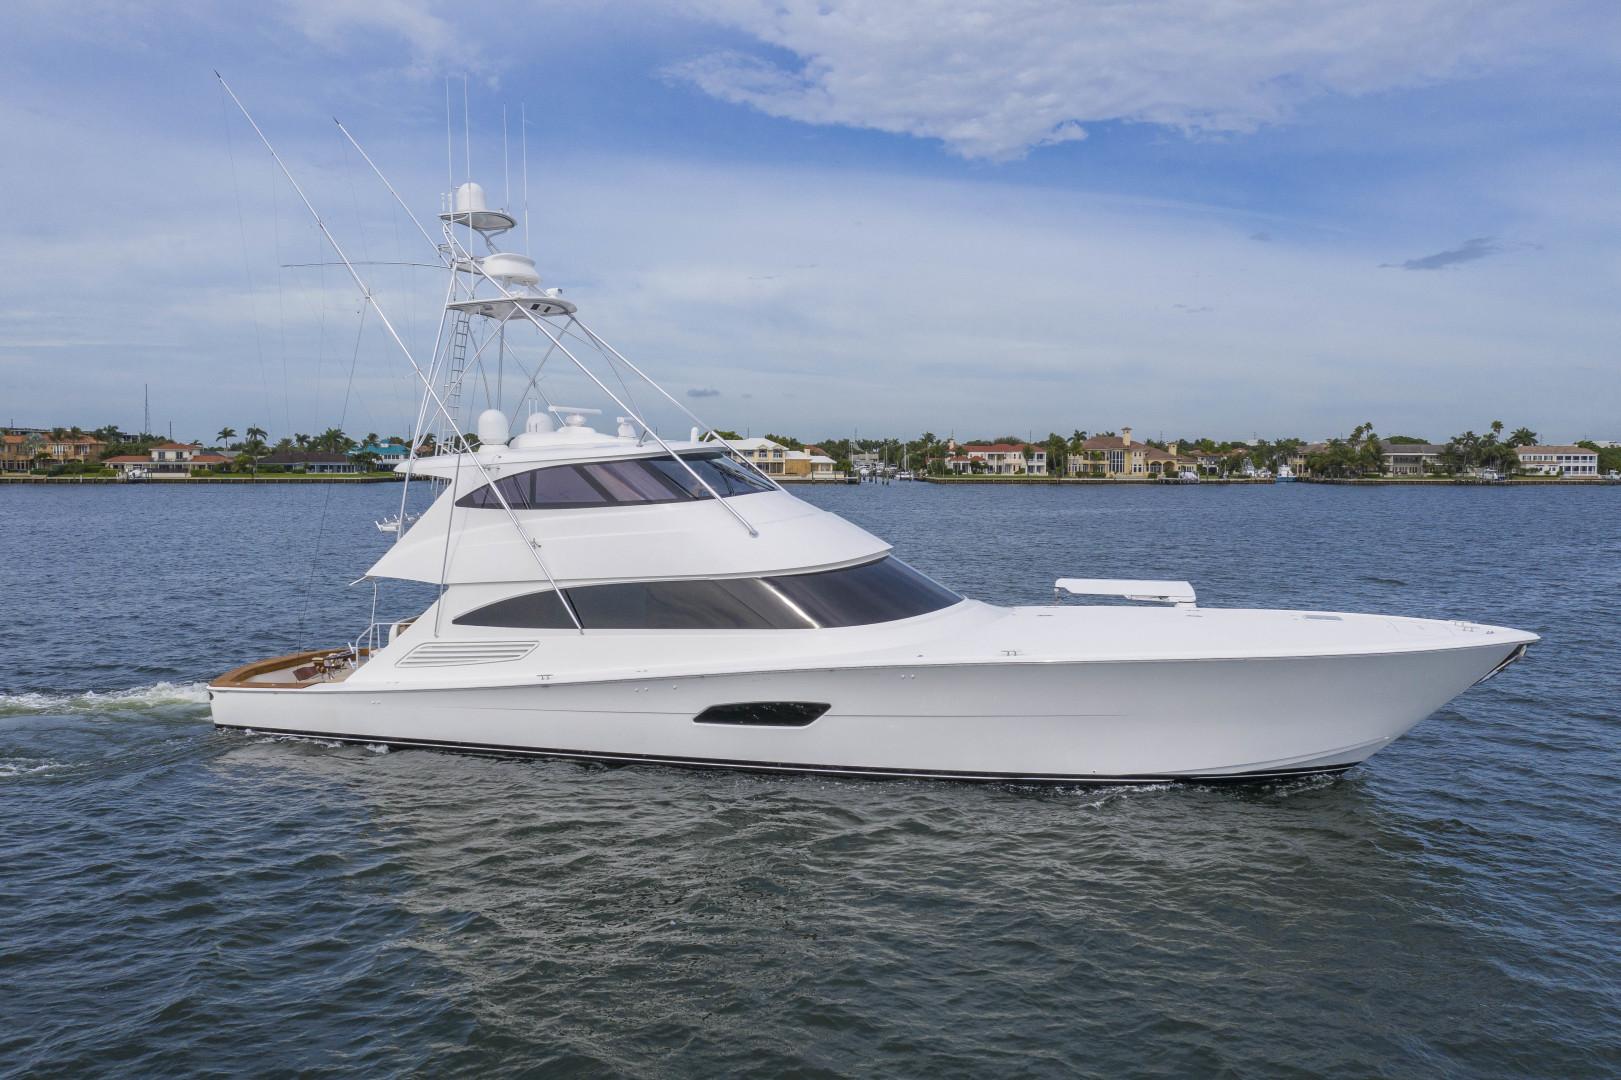 92' Viking 2016 Enclosed Bridge Sportfish Bella Dona Di